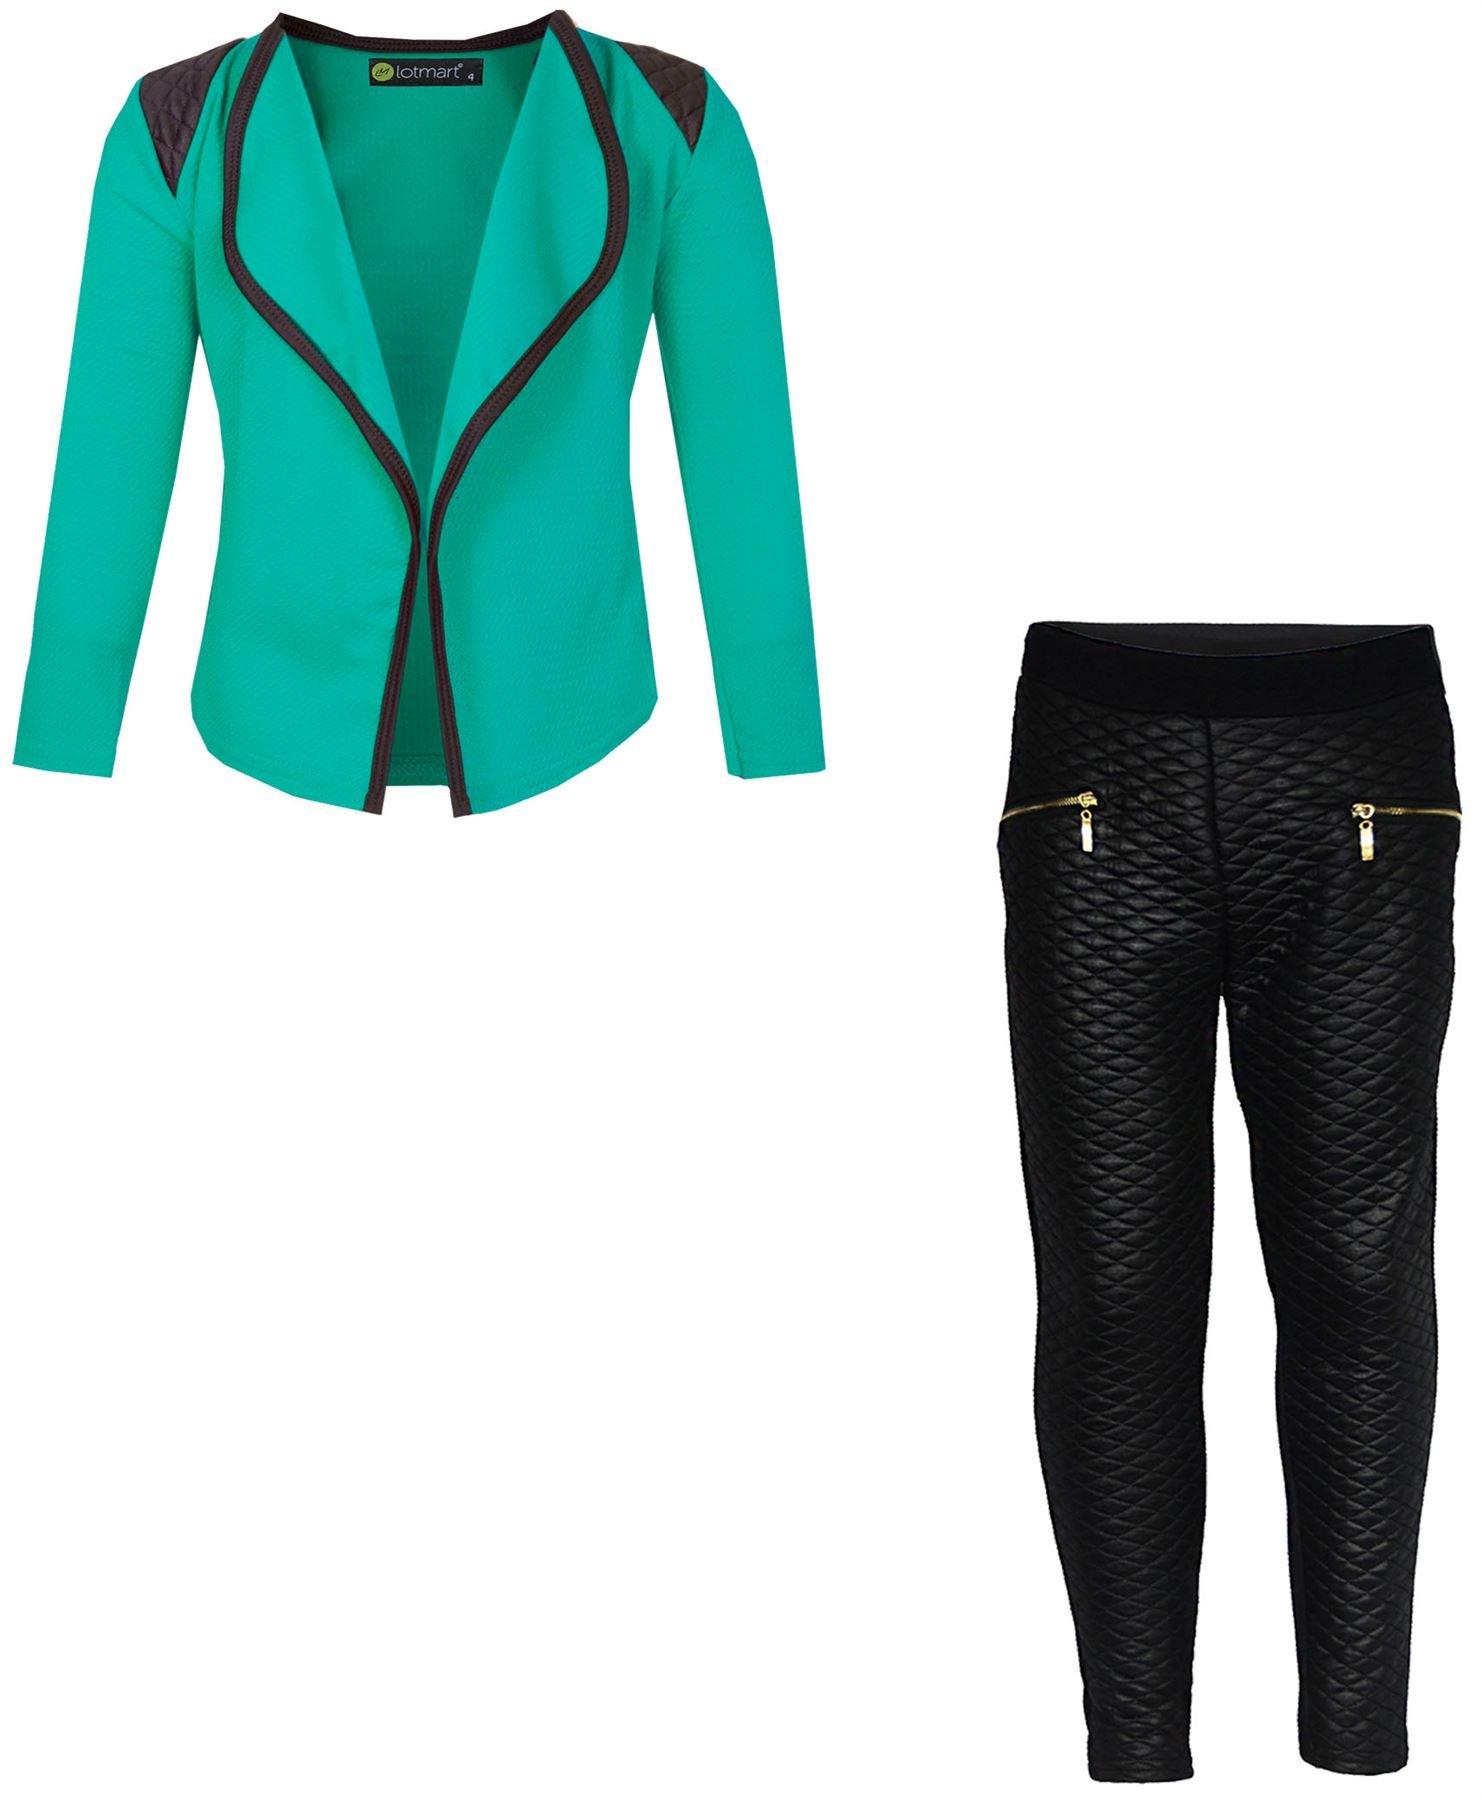 LotMart Girls Blazer Bundle Textured Leggings Style 3 in Mint Black 5-6 Y